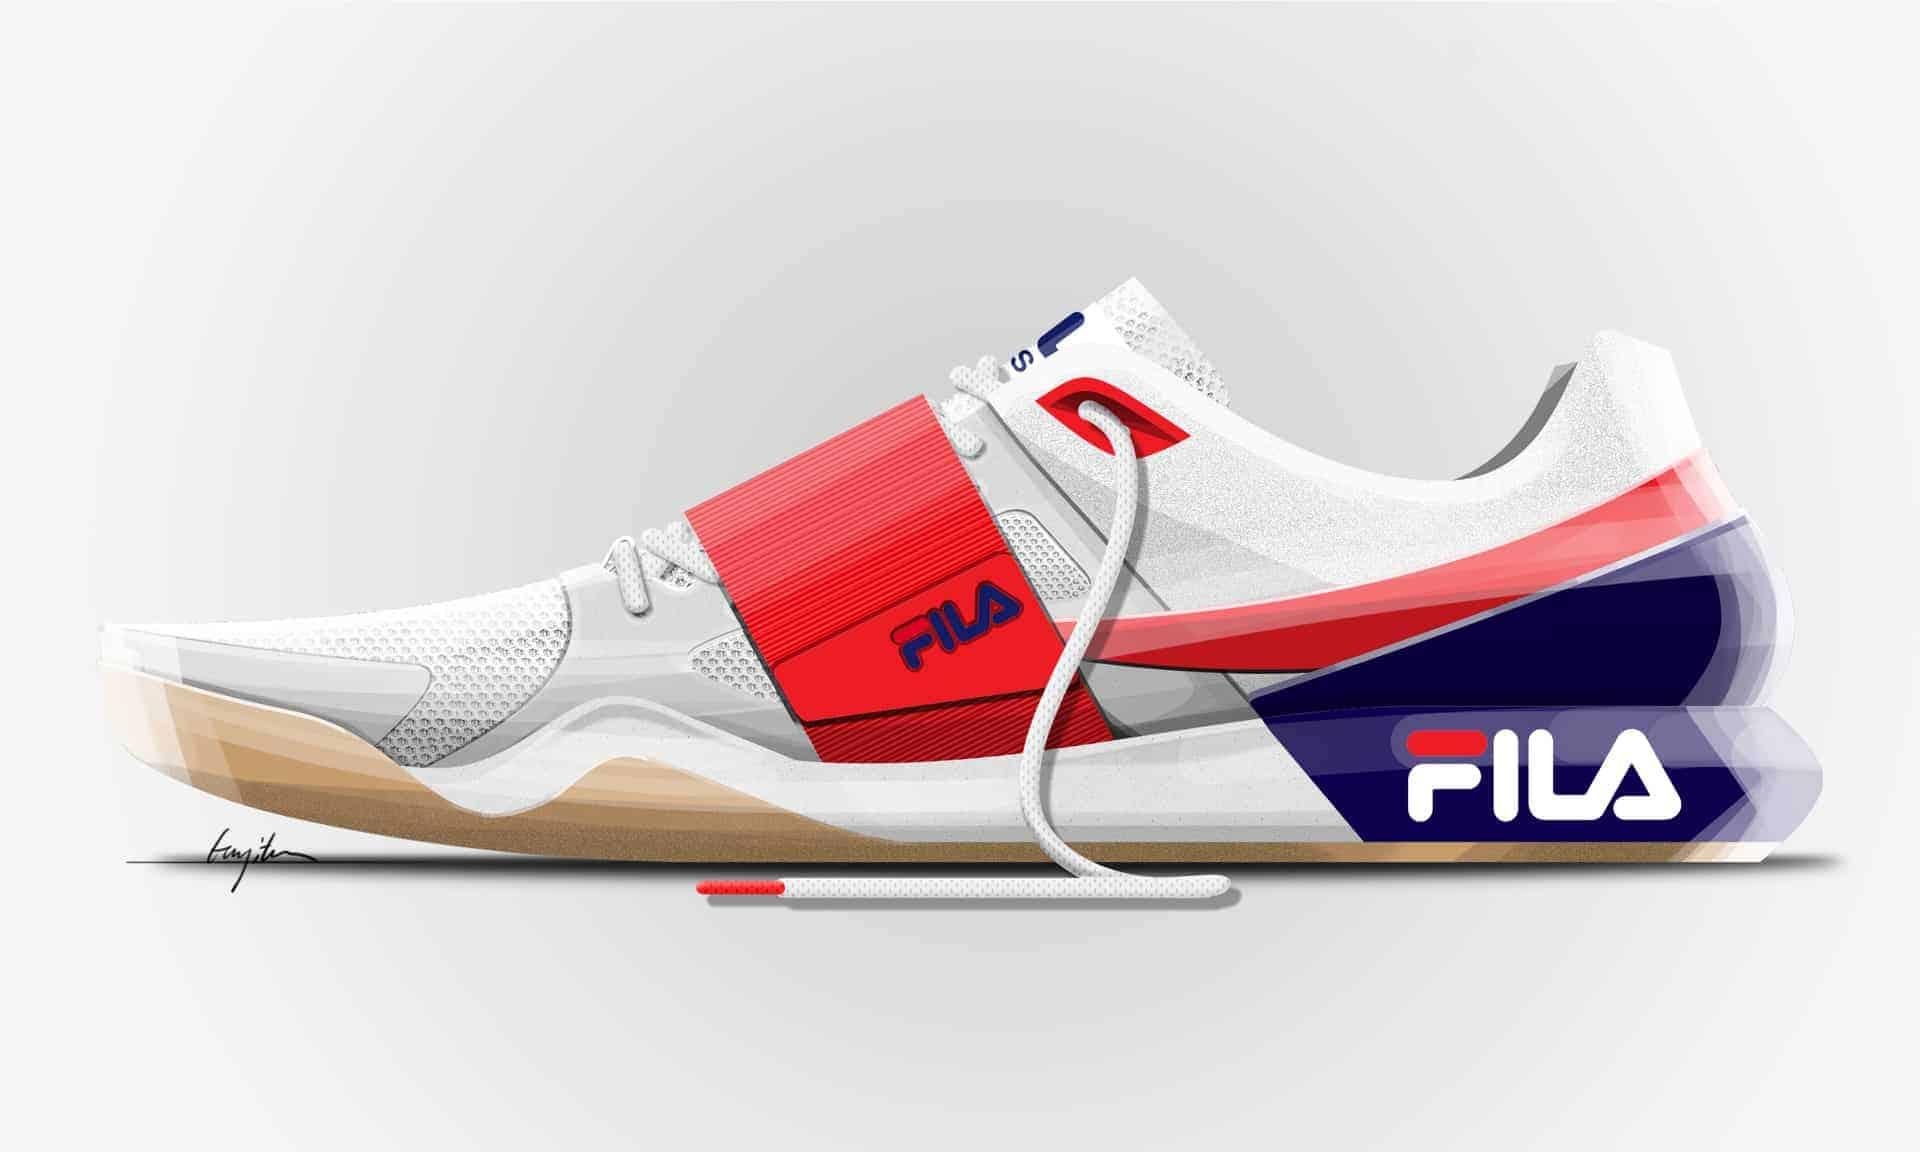 fila shoes nzb downloader for mac